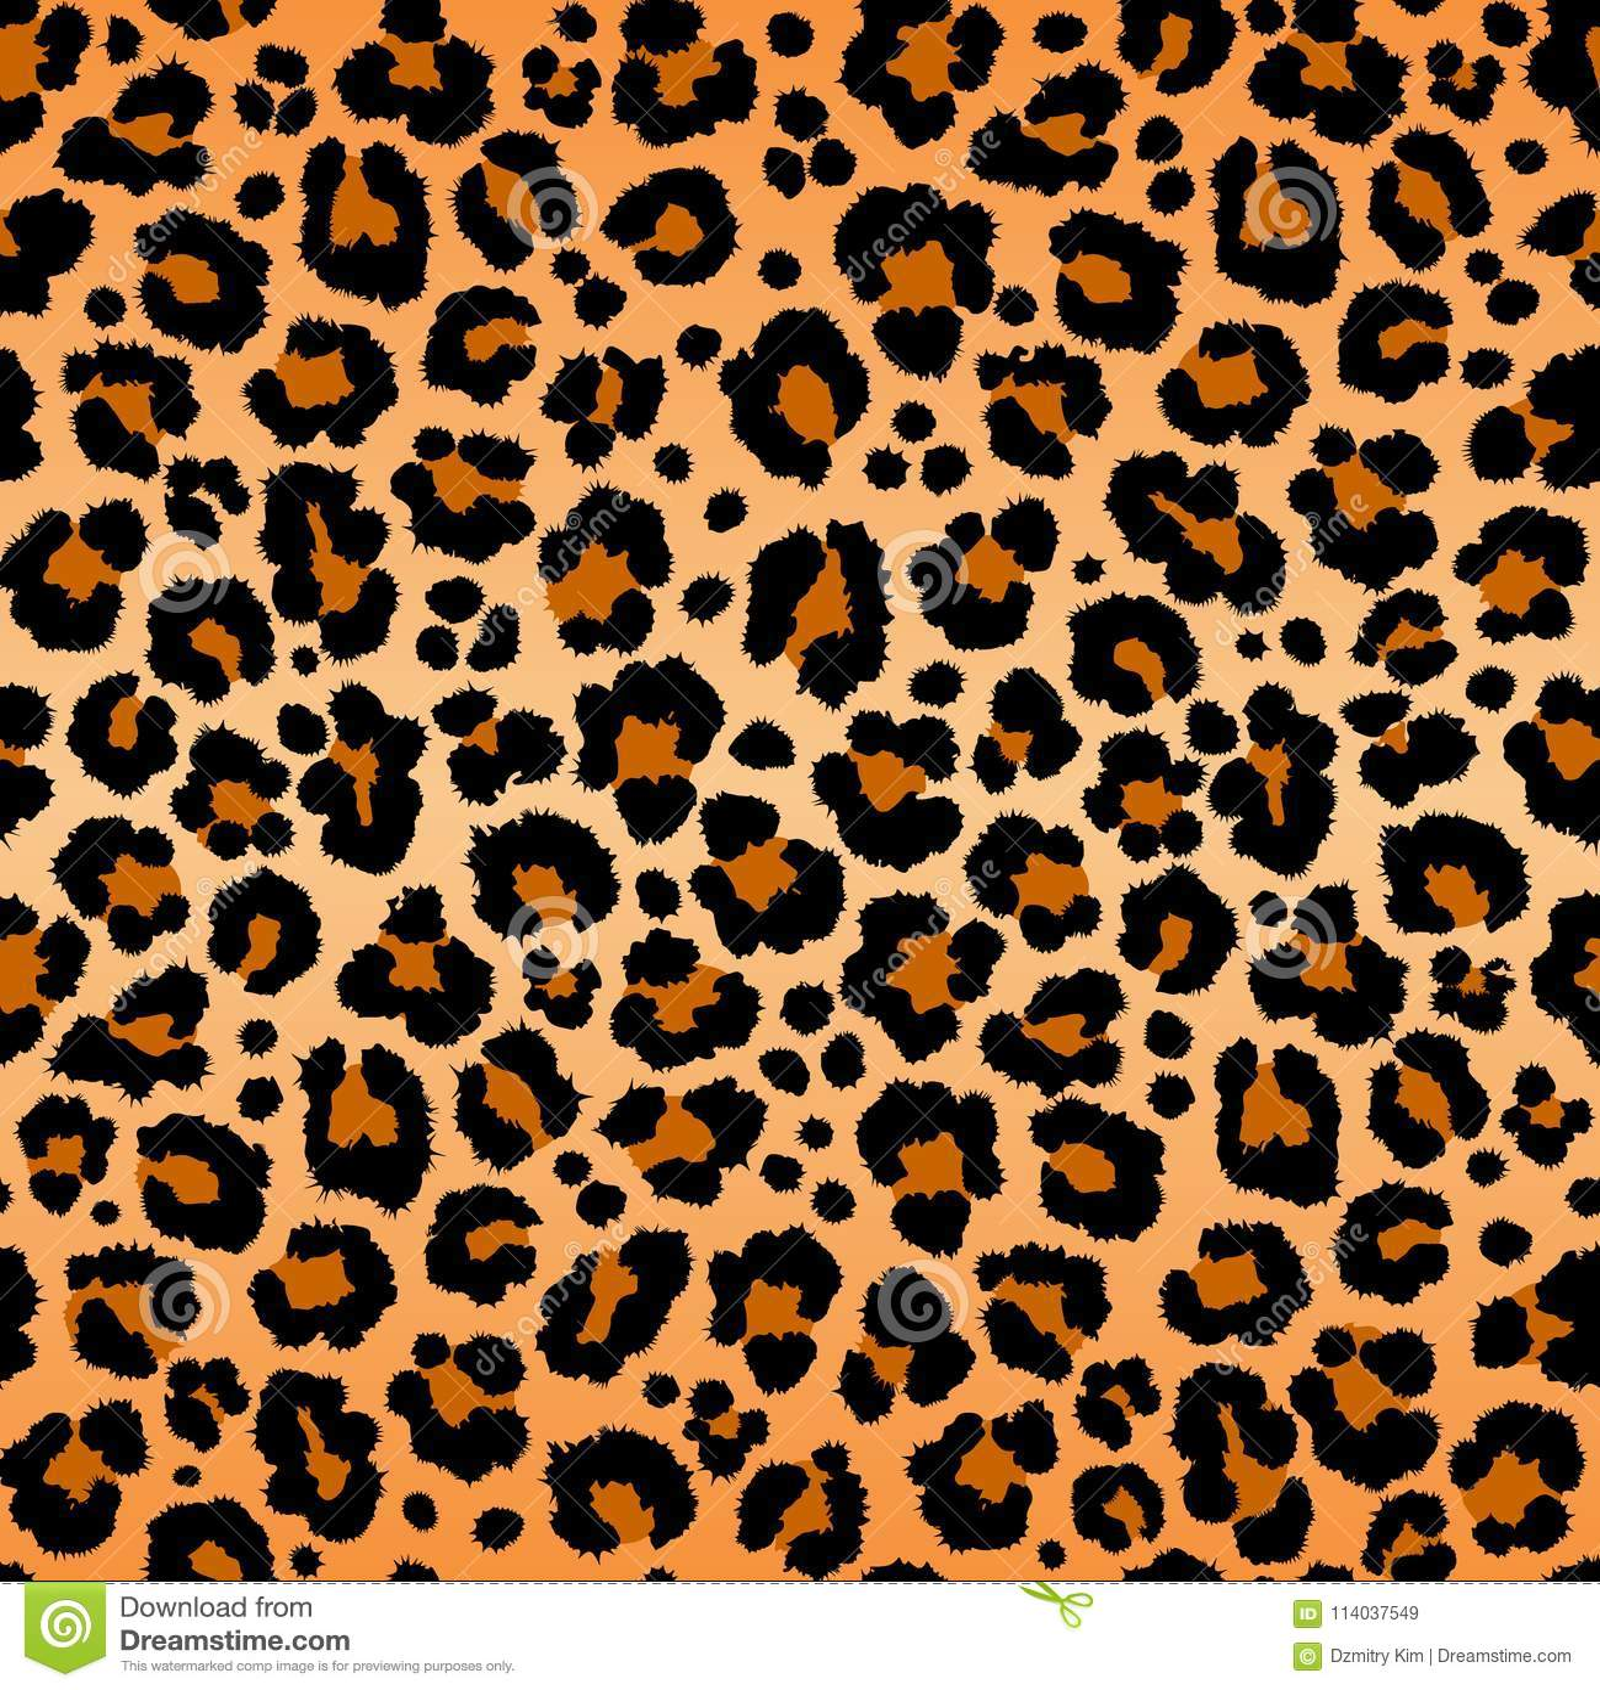 771bae9ca9ea Leopard pattern texture repeating seamless orange black fur print skin